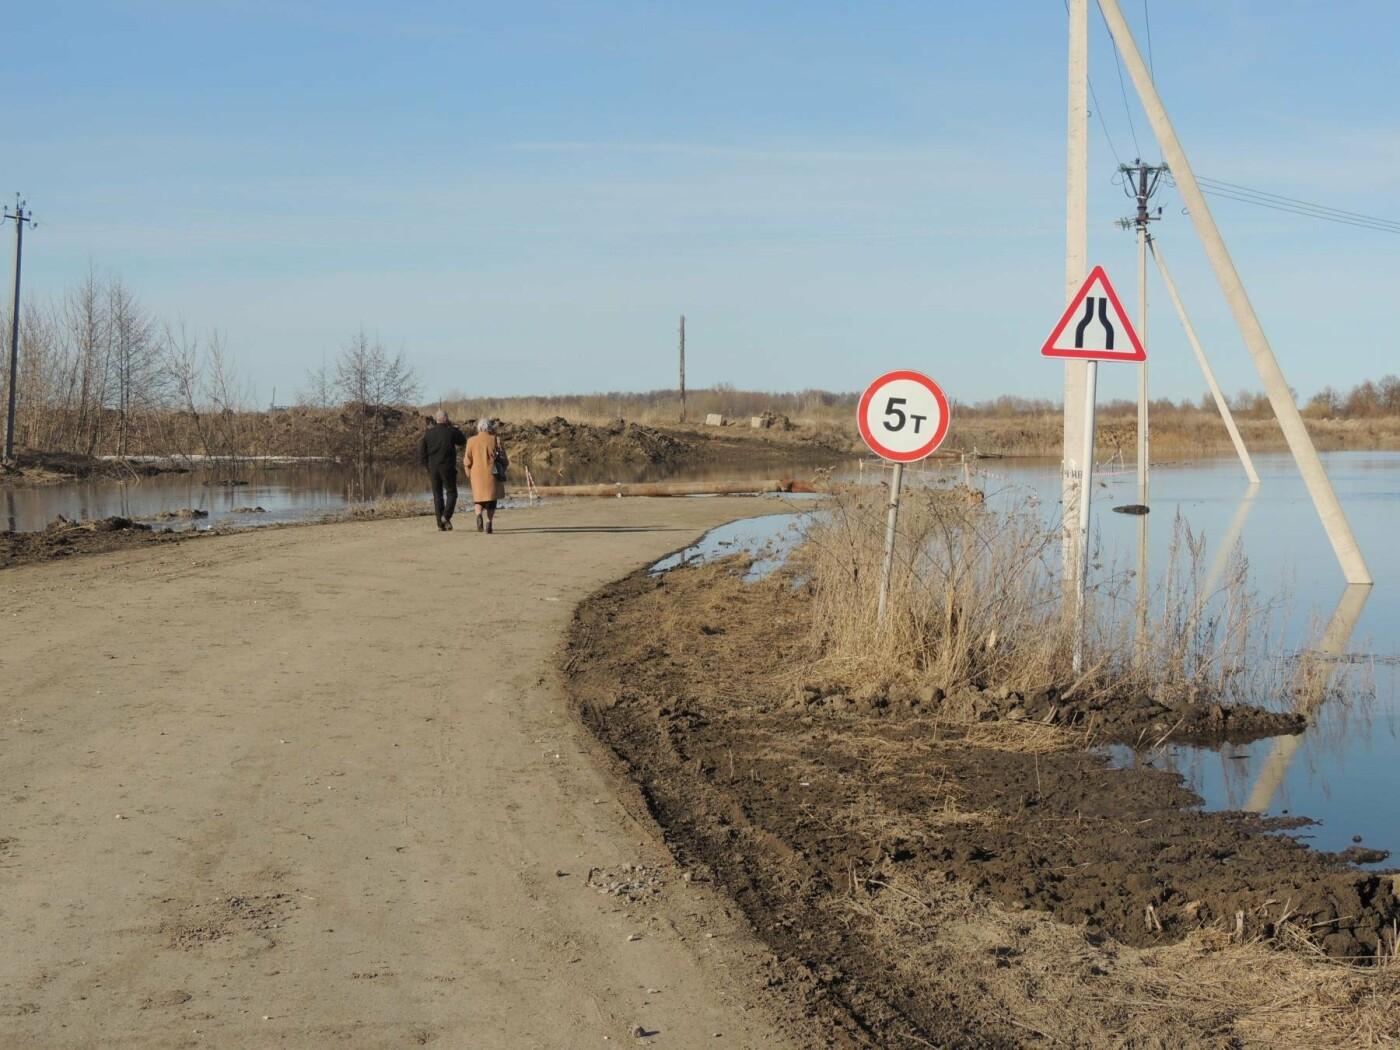 Тамбовские села отрезаны от внешнего мира паводком, фото-6